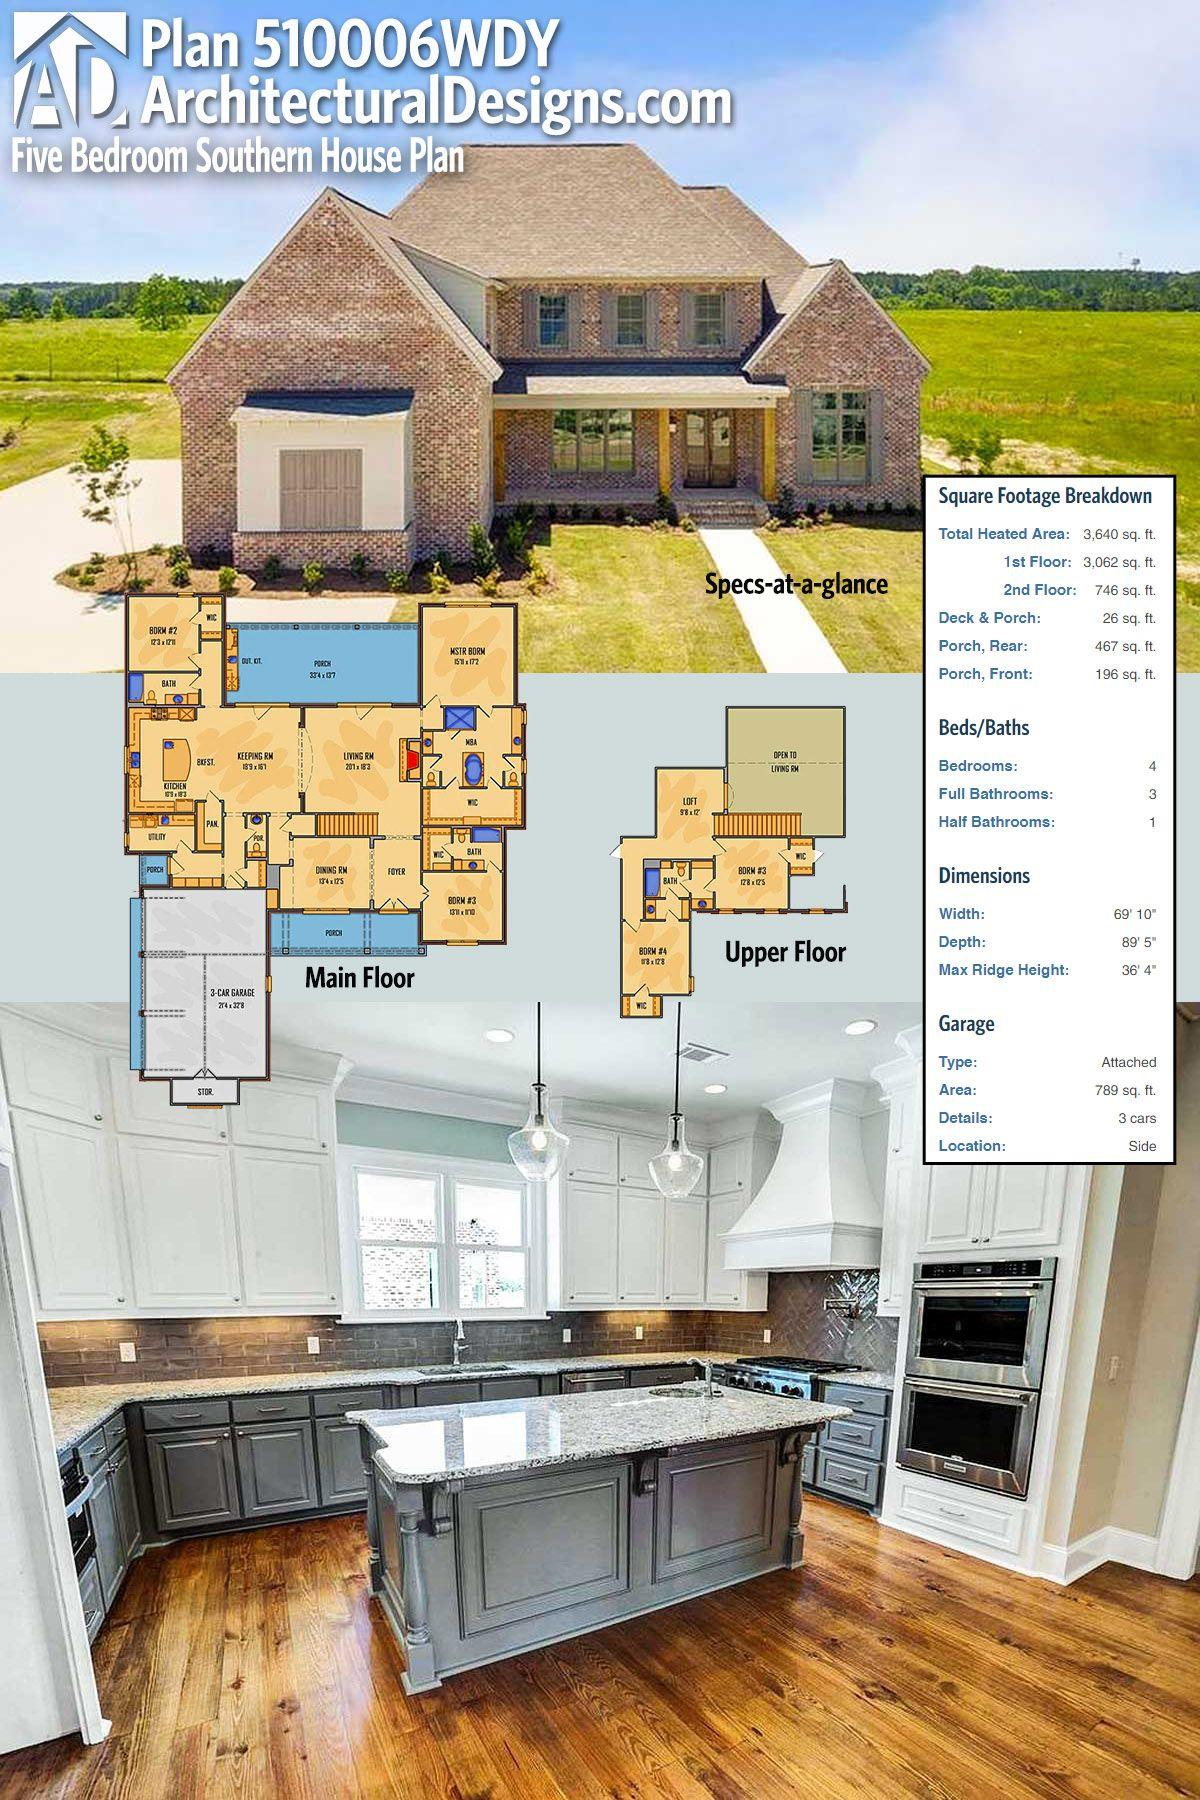 Plan wdy five bedroom southern house plan southern house